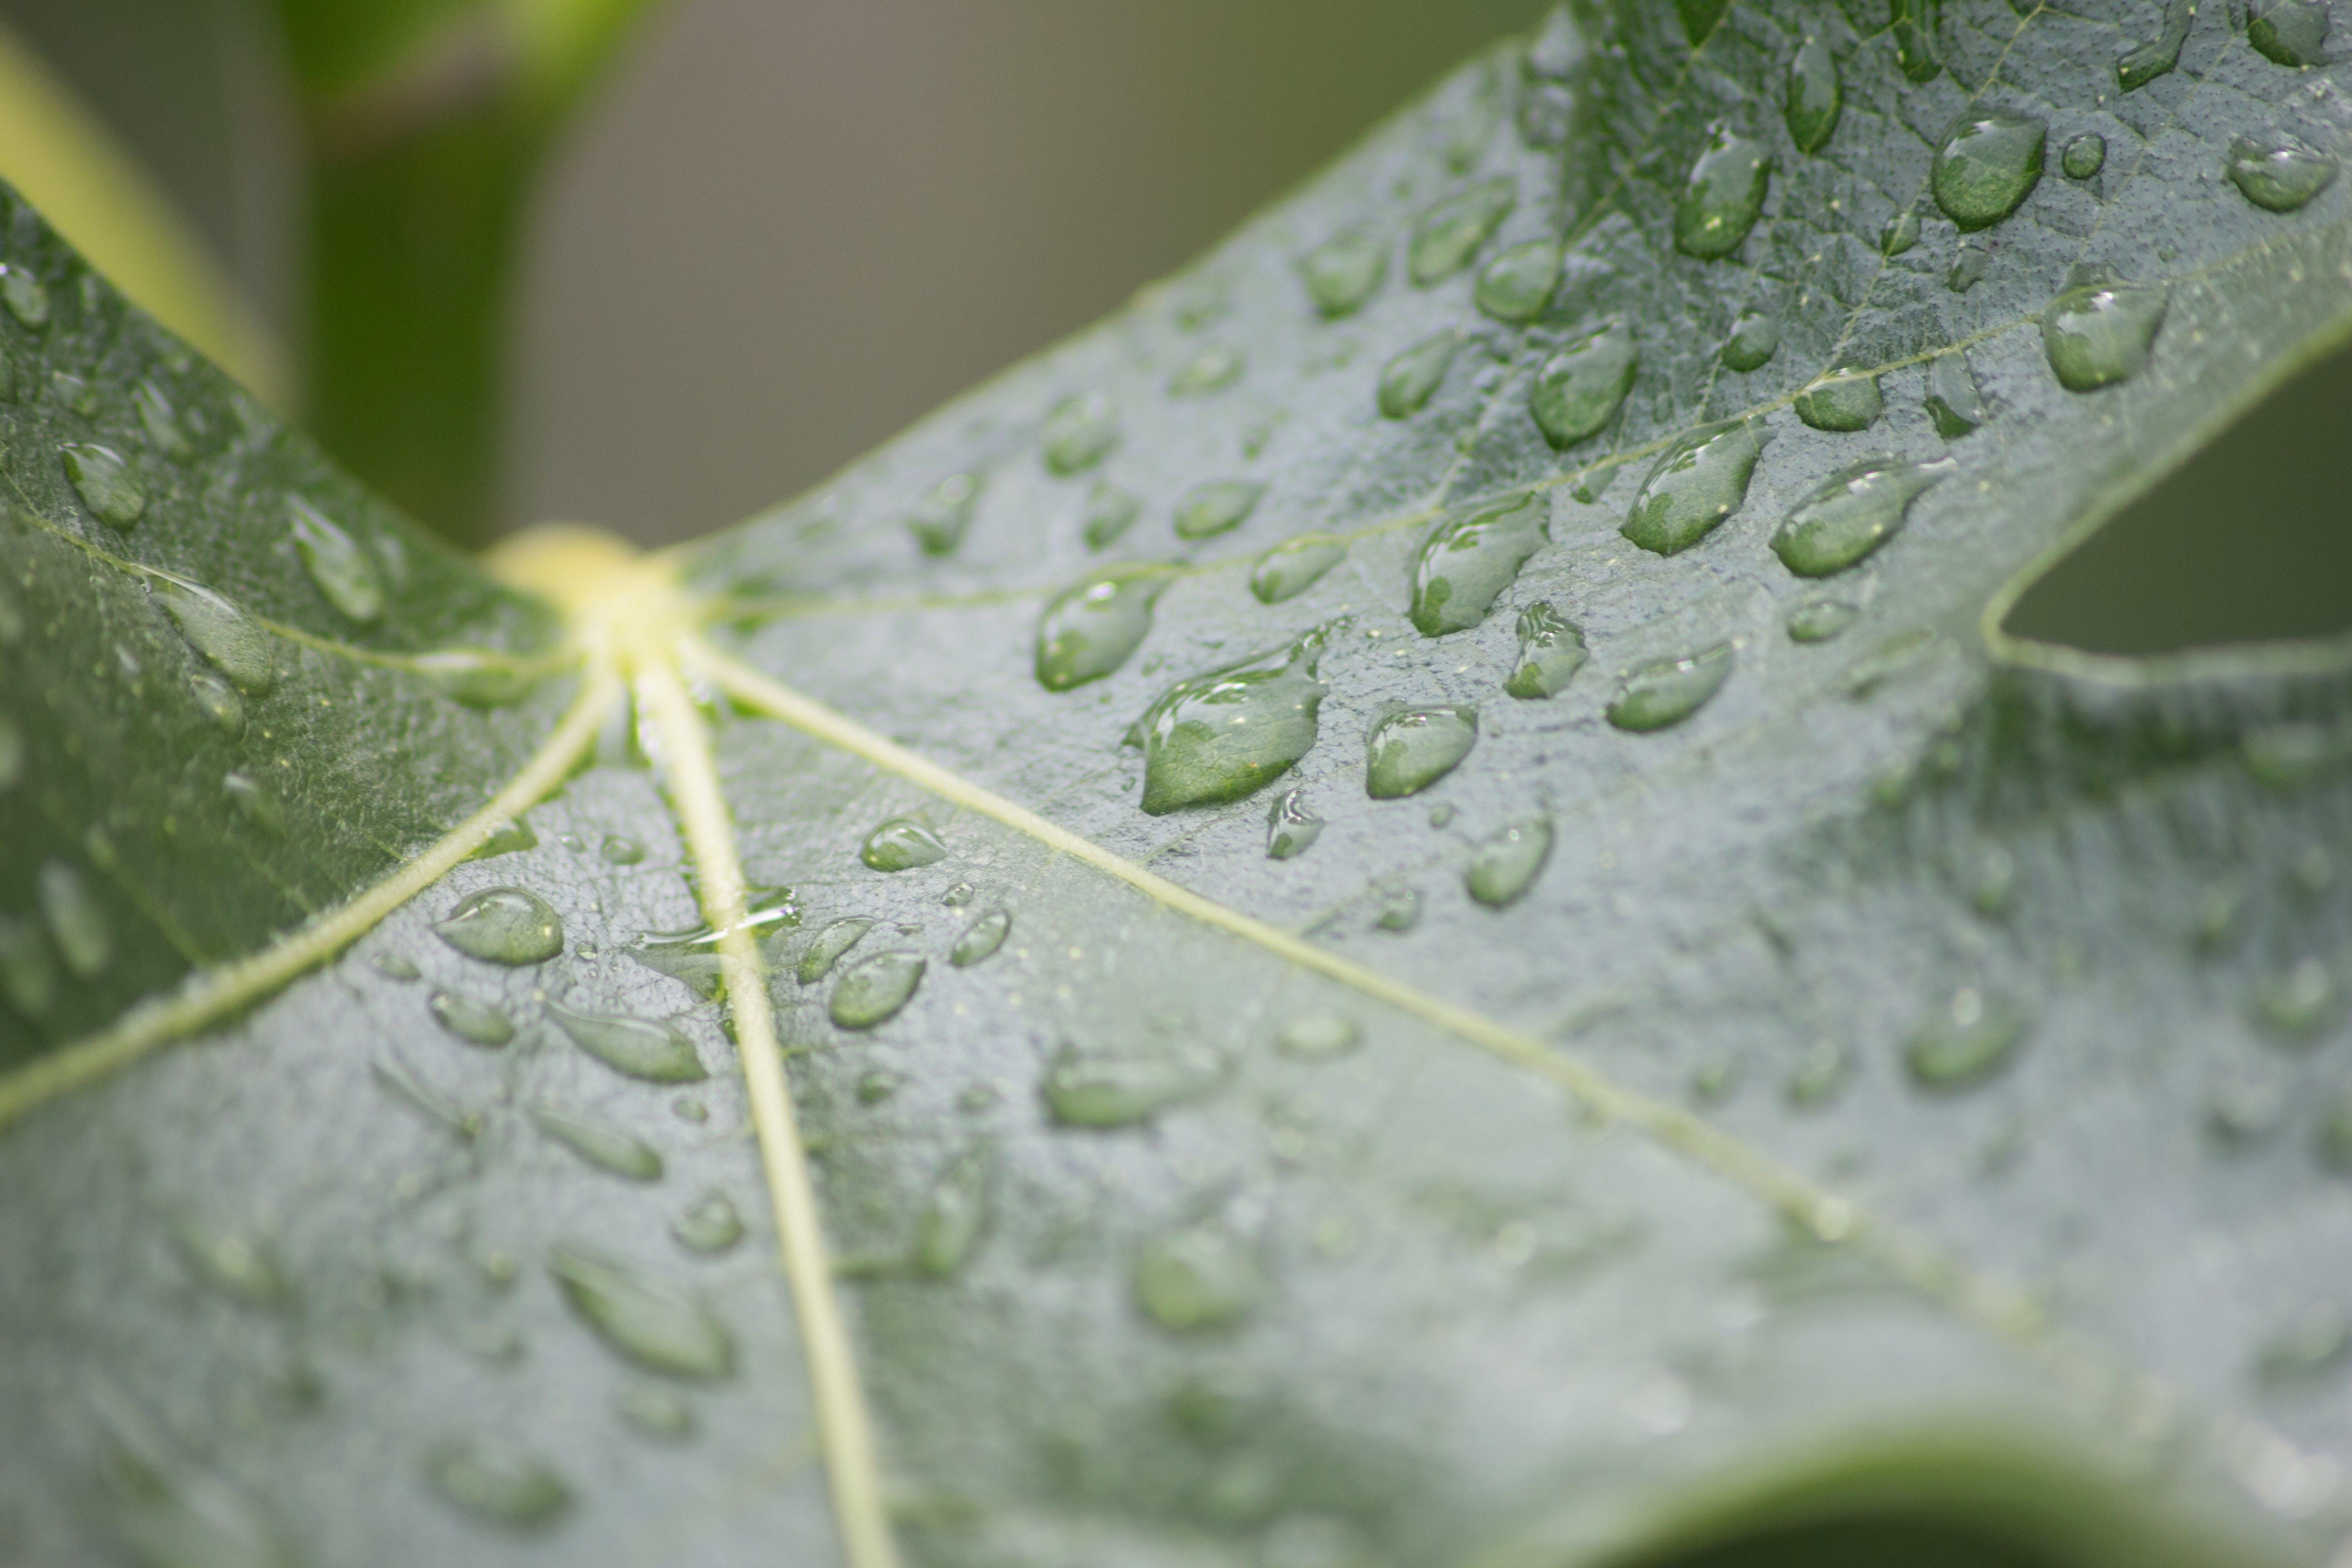 Free stock photo of closeup, drop, drop of water, green